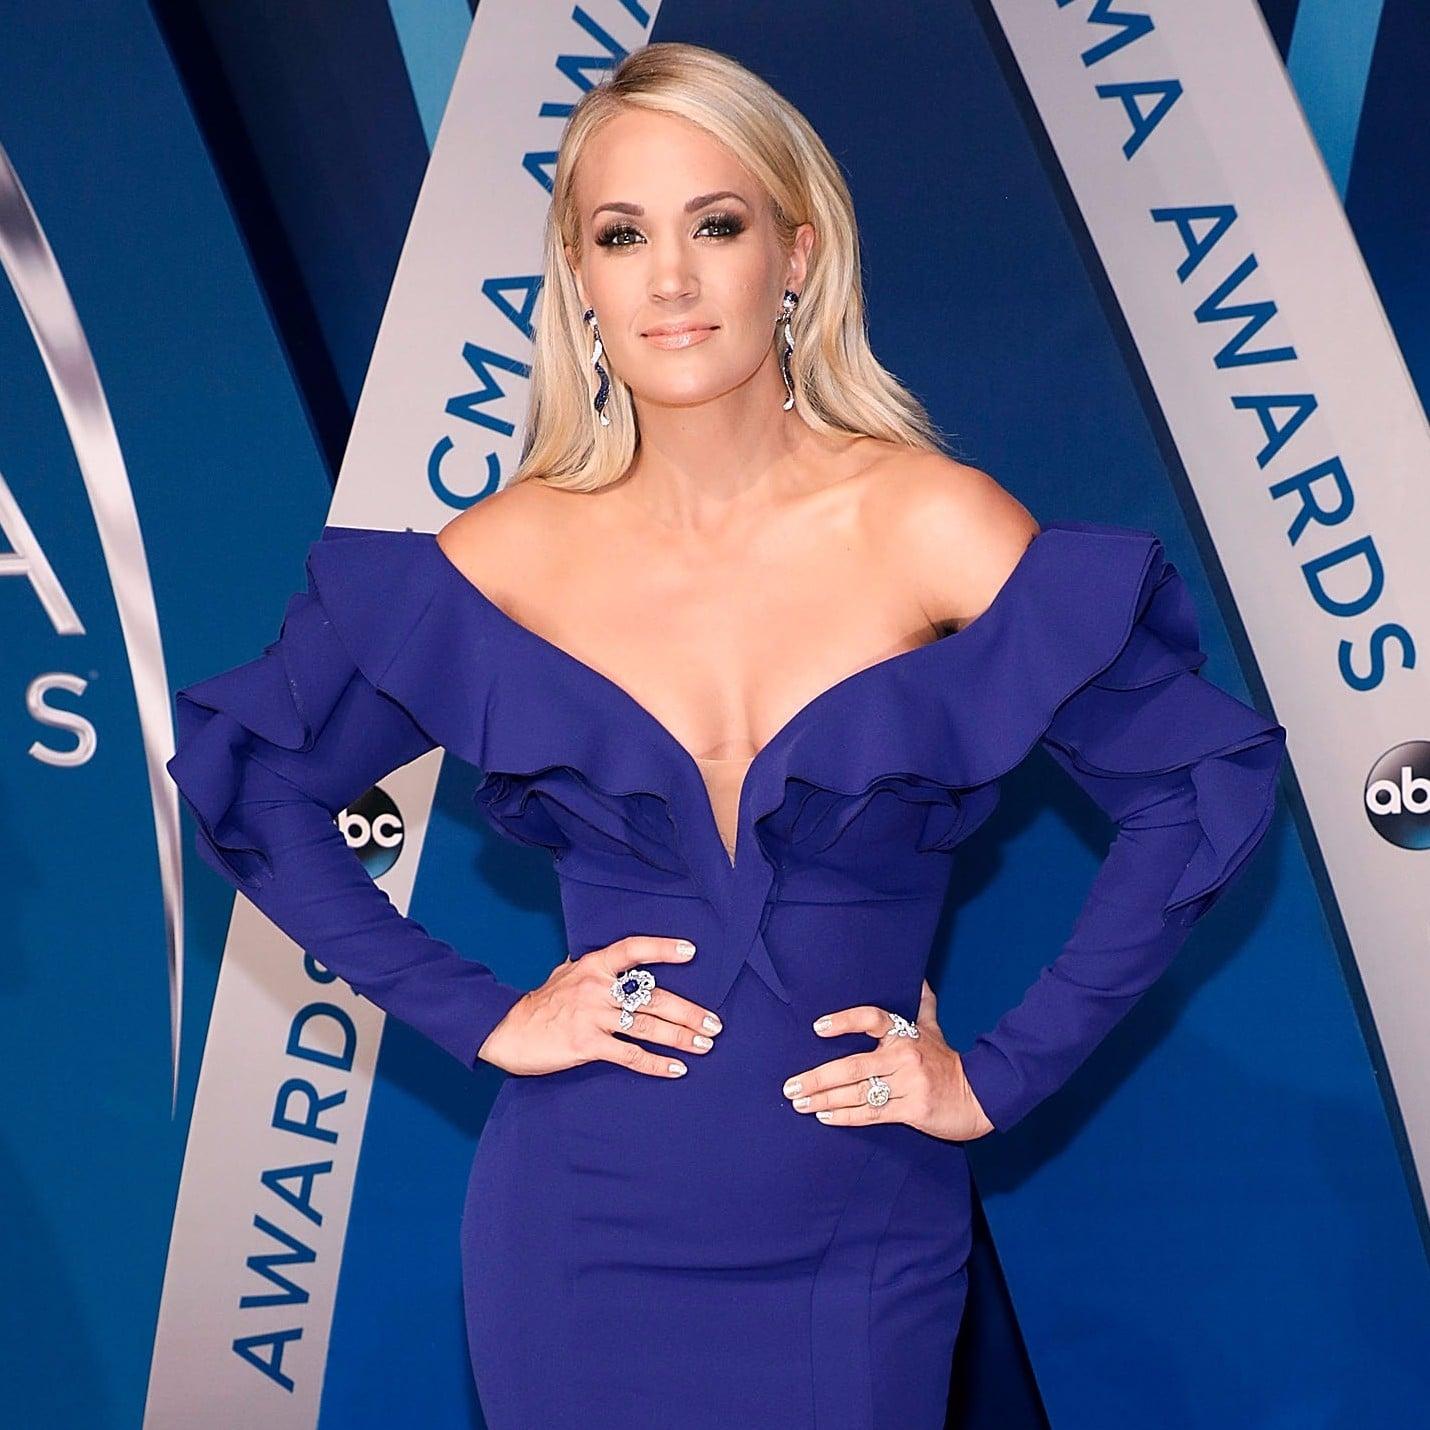 Cma awards 2018 carrie underwood dresses images